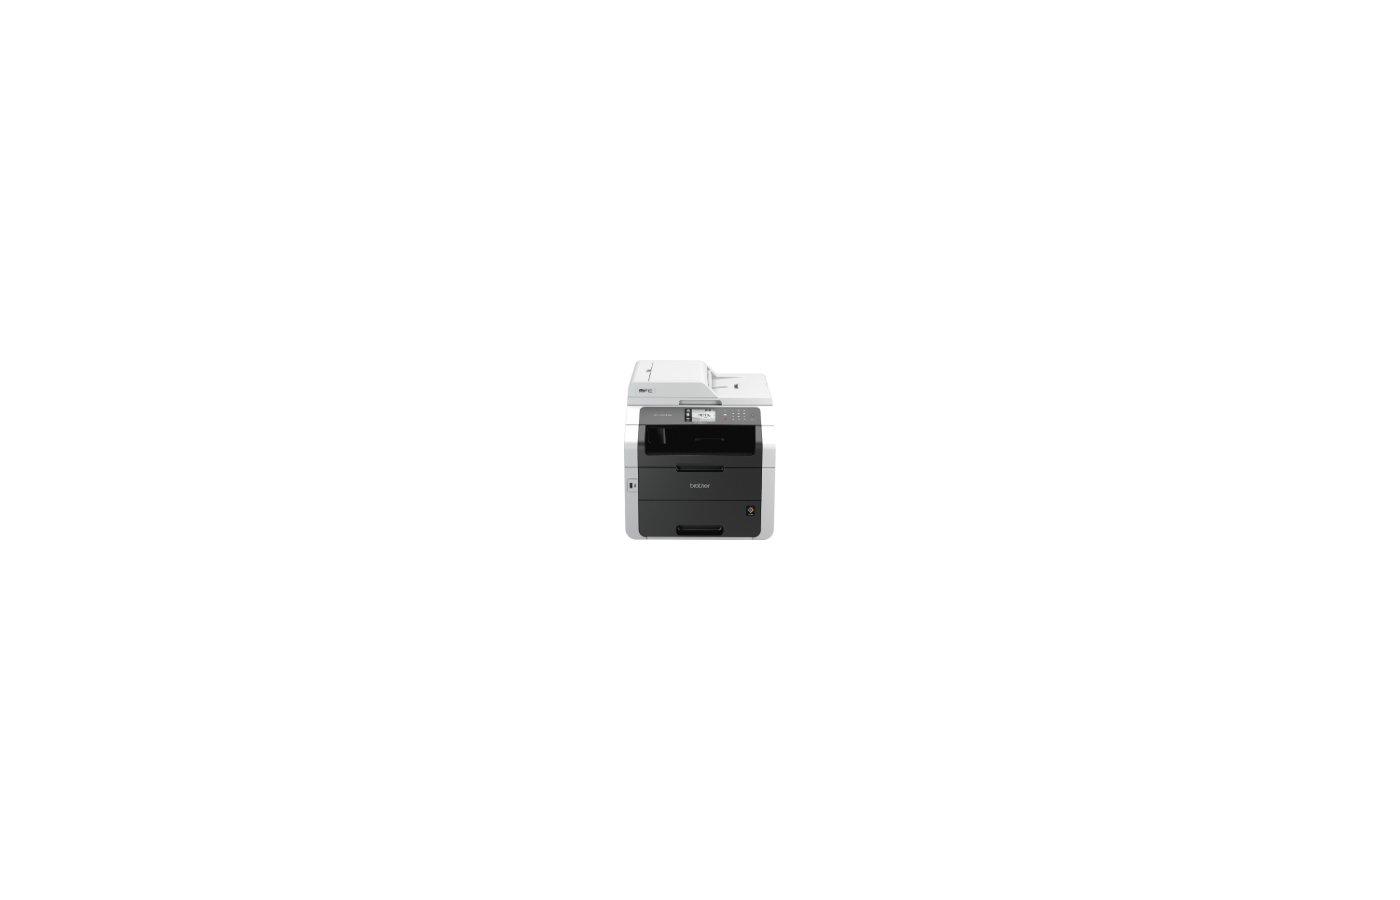 МФУ Brother MFC-9330CDW A4 Duplex WiFi черный